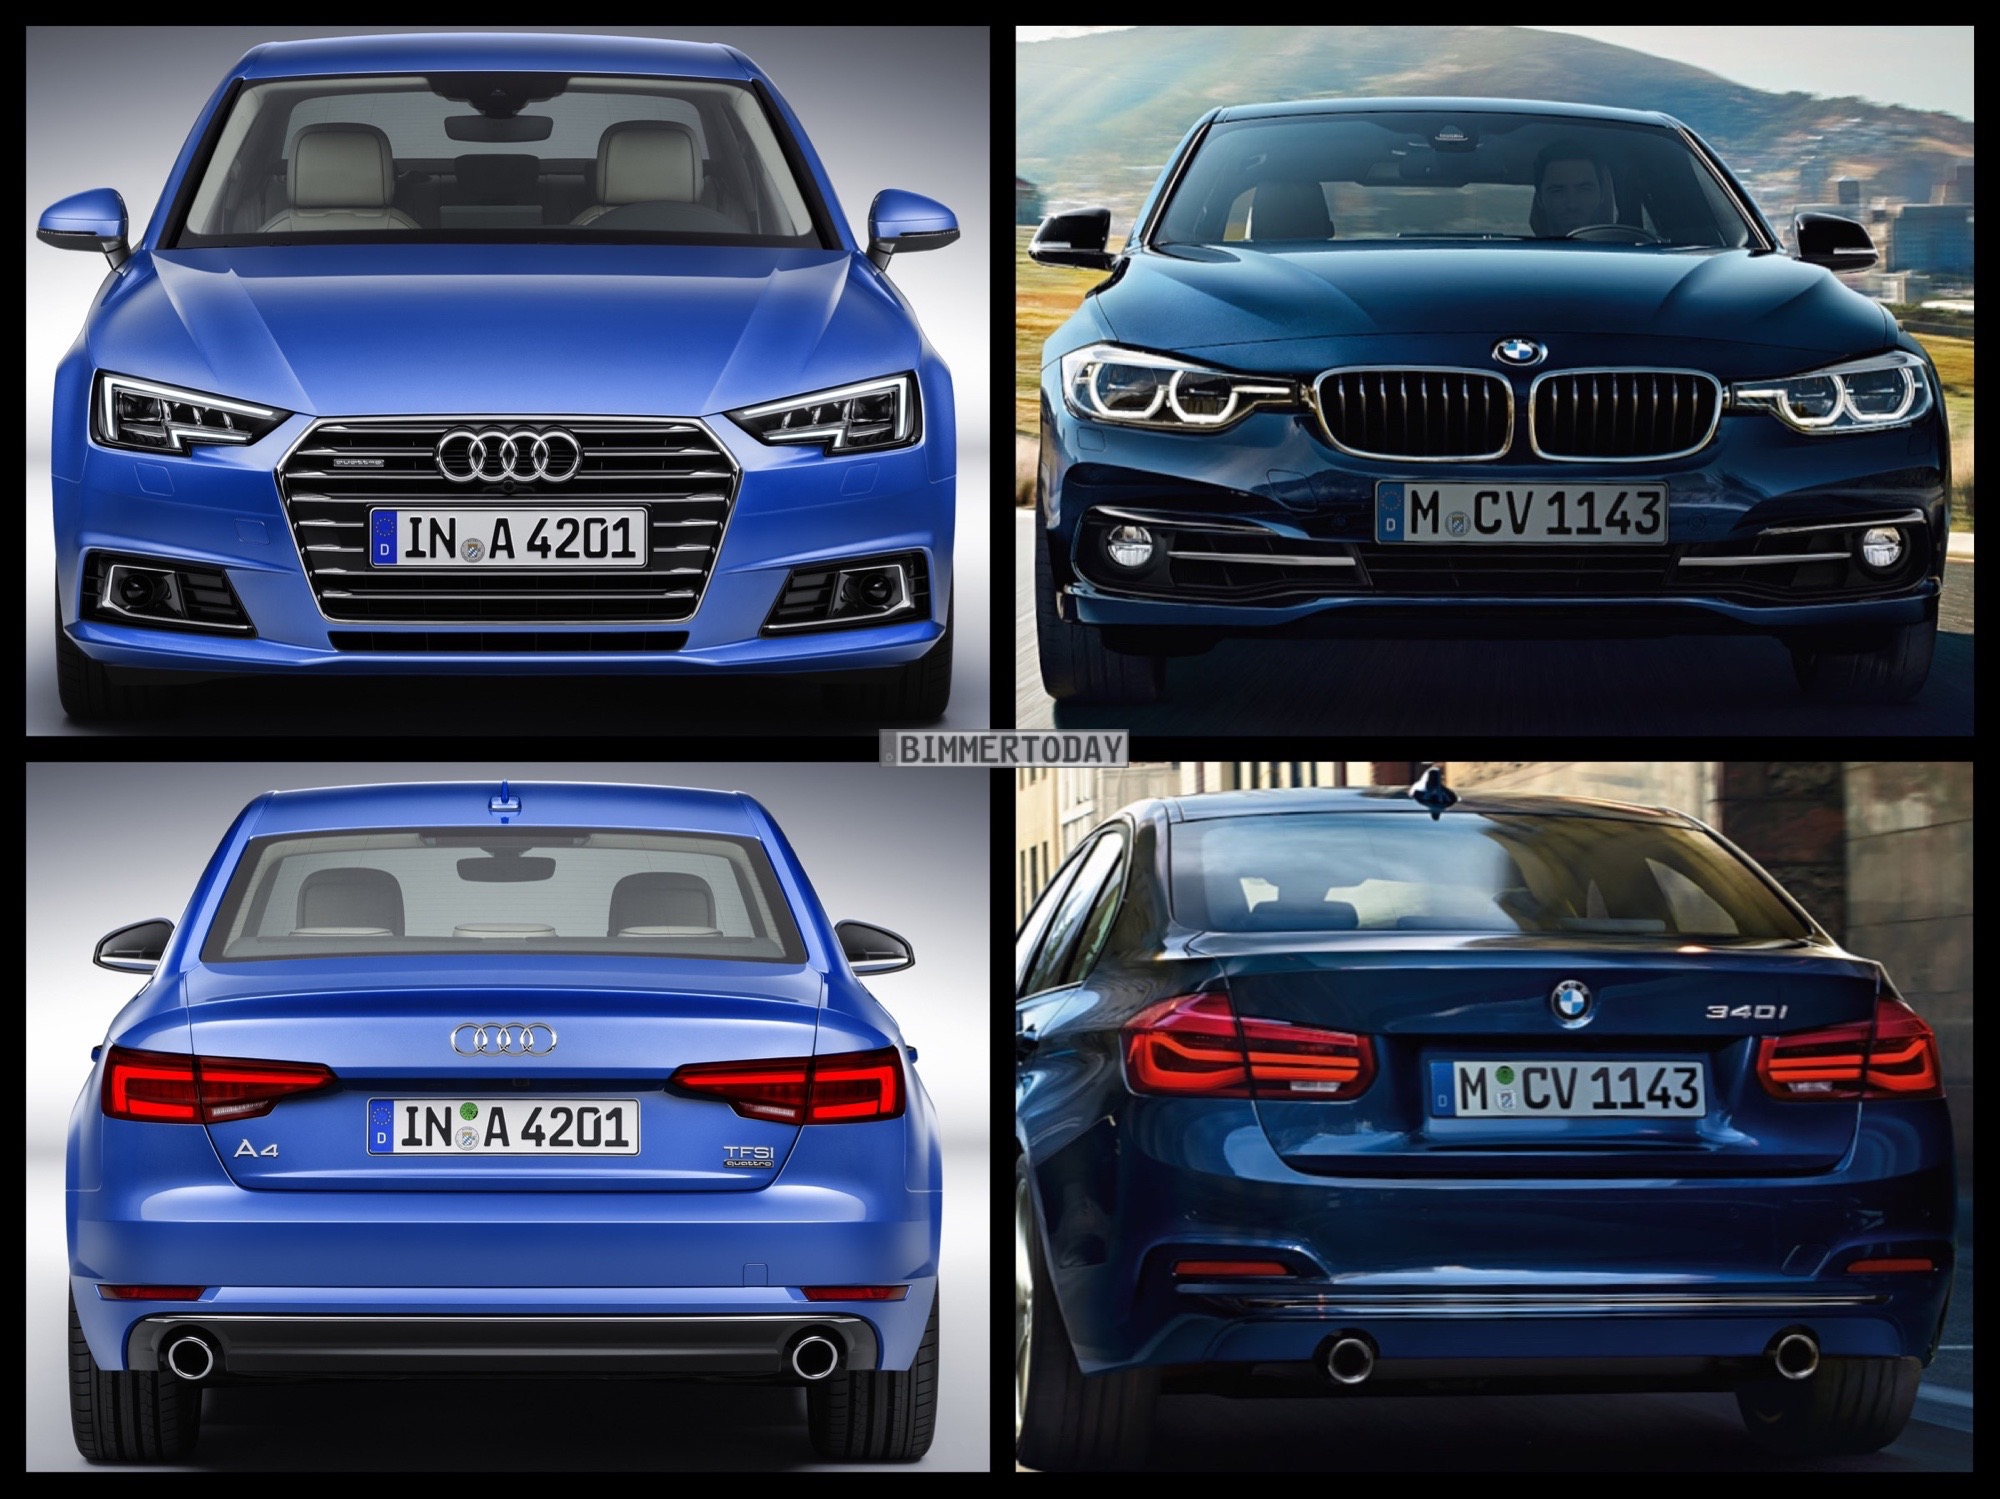 Bild Vergleich BMW 3er F30 LCI Audi A4 Limousine 2015 04